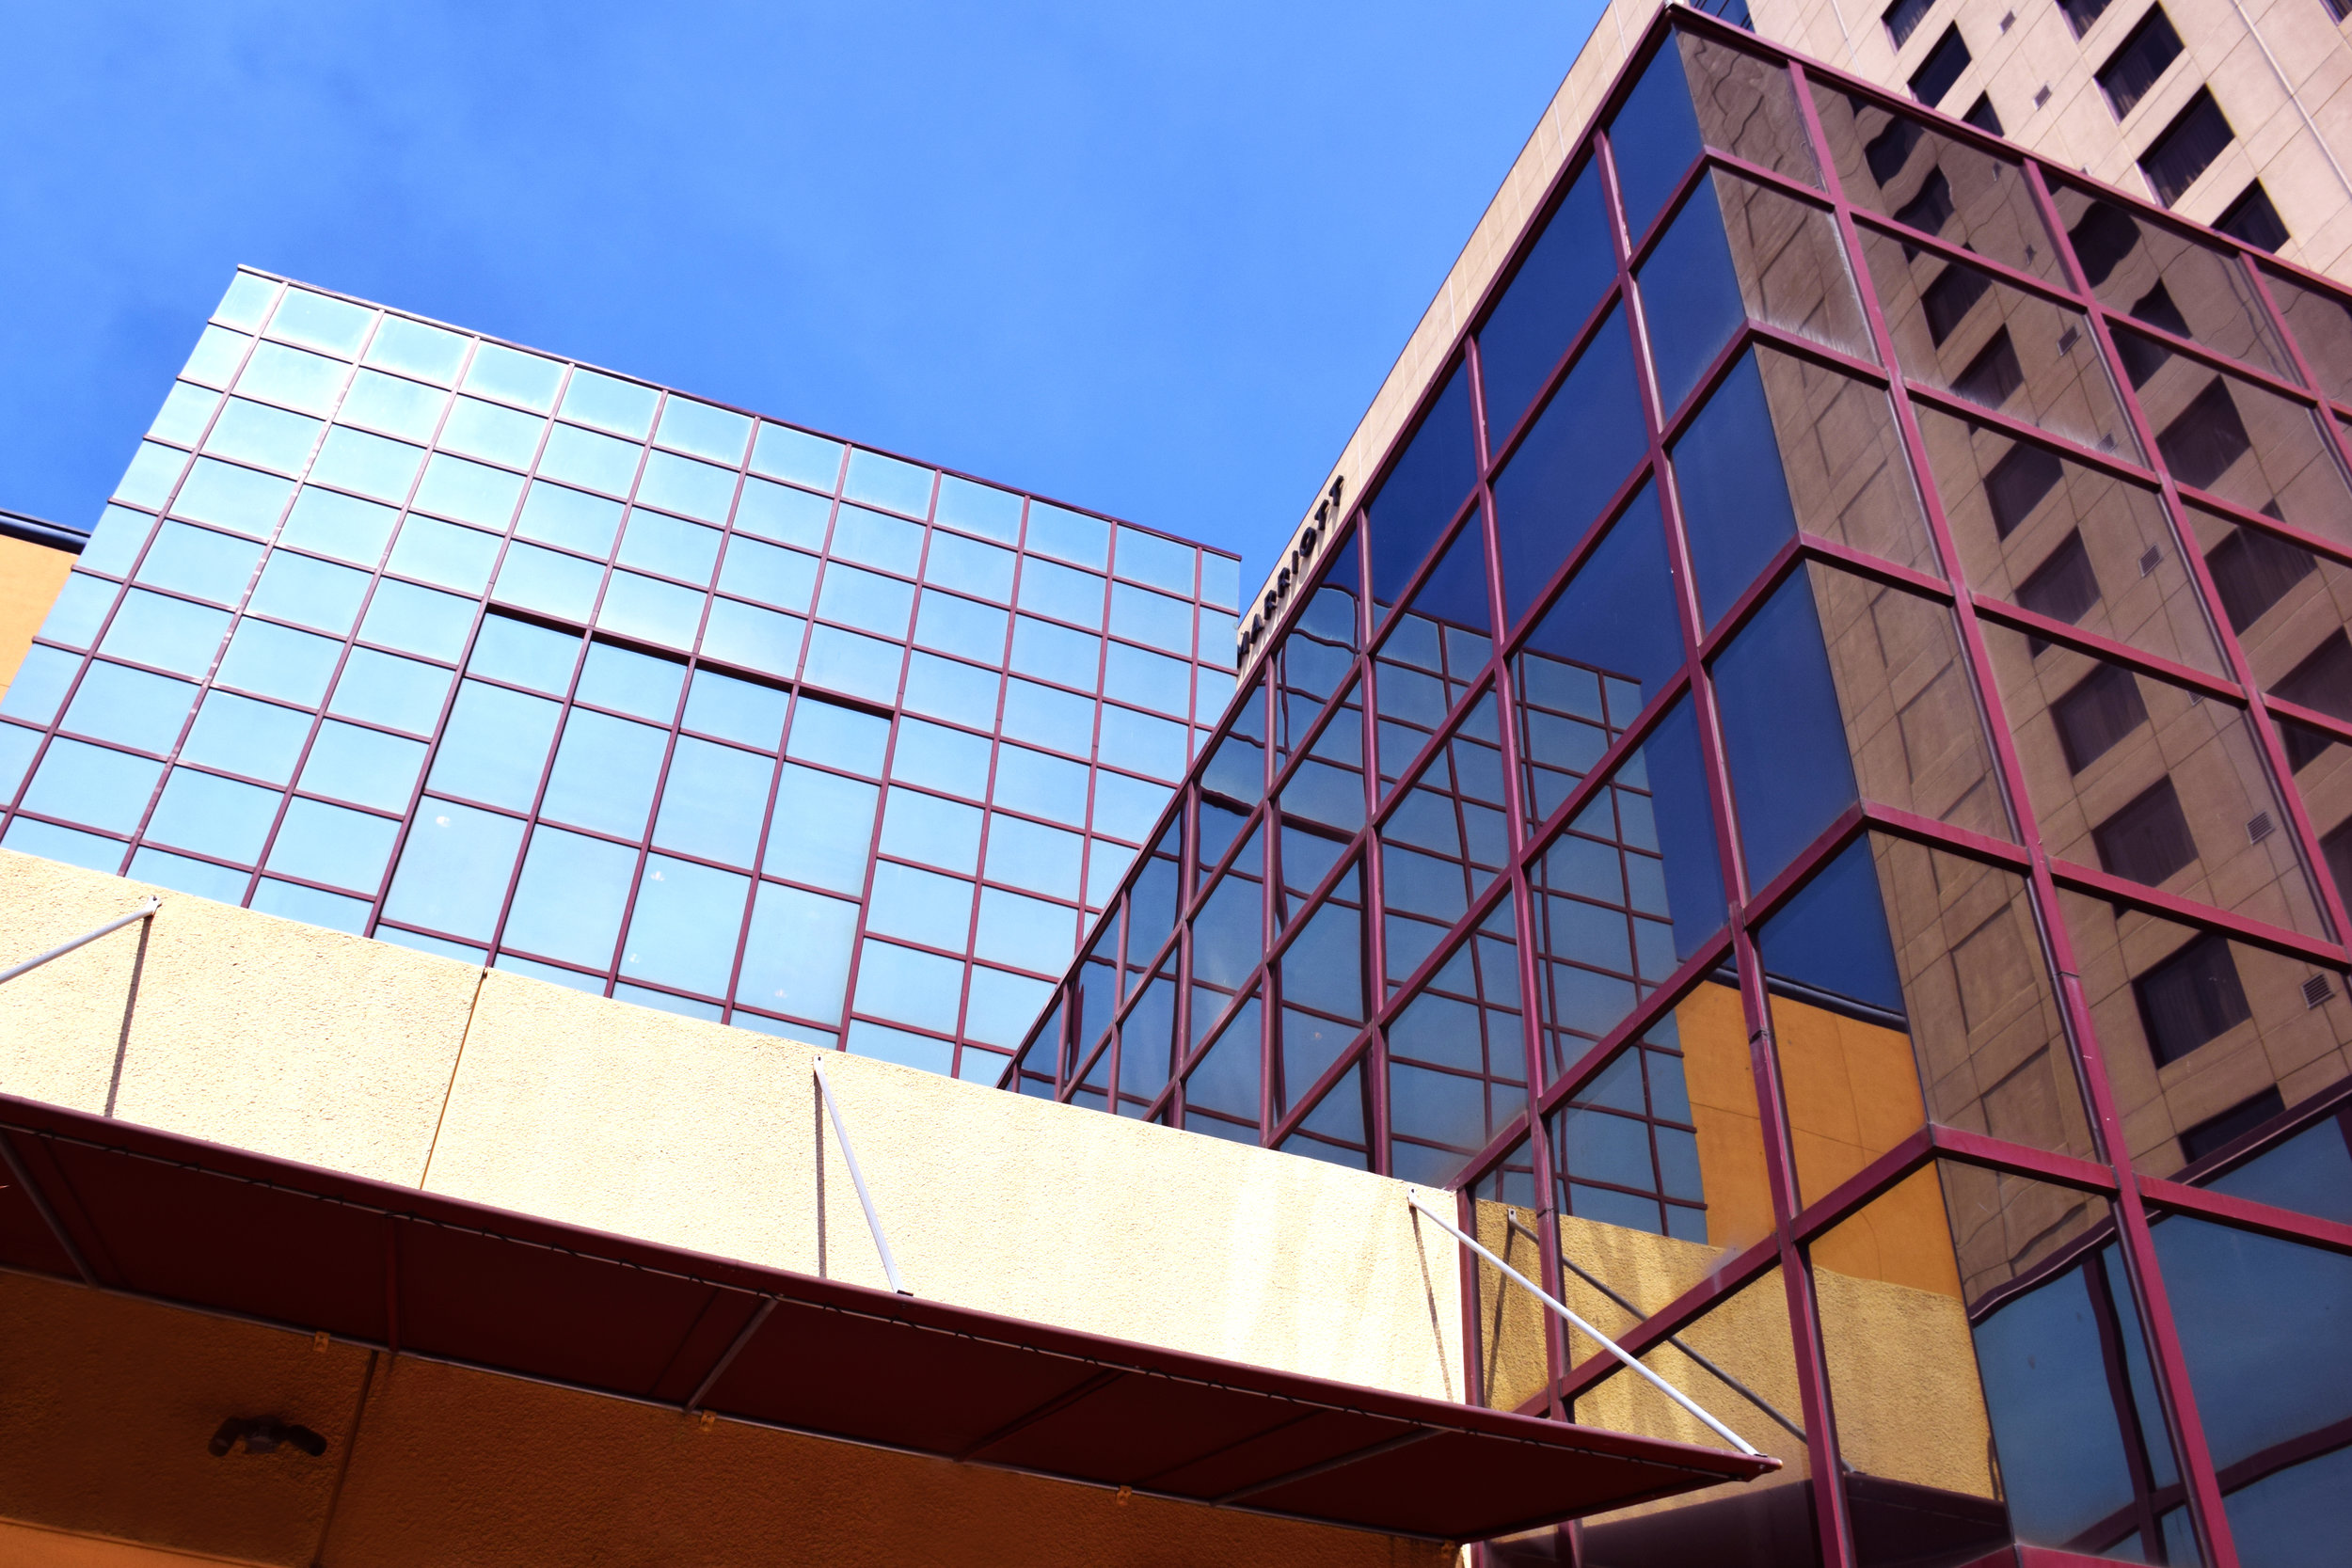 Exterior View from Mezzanine Level Terrace